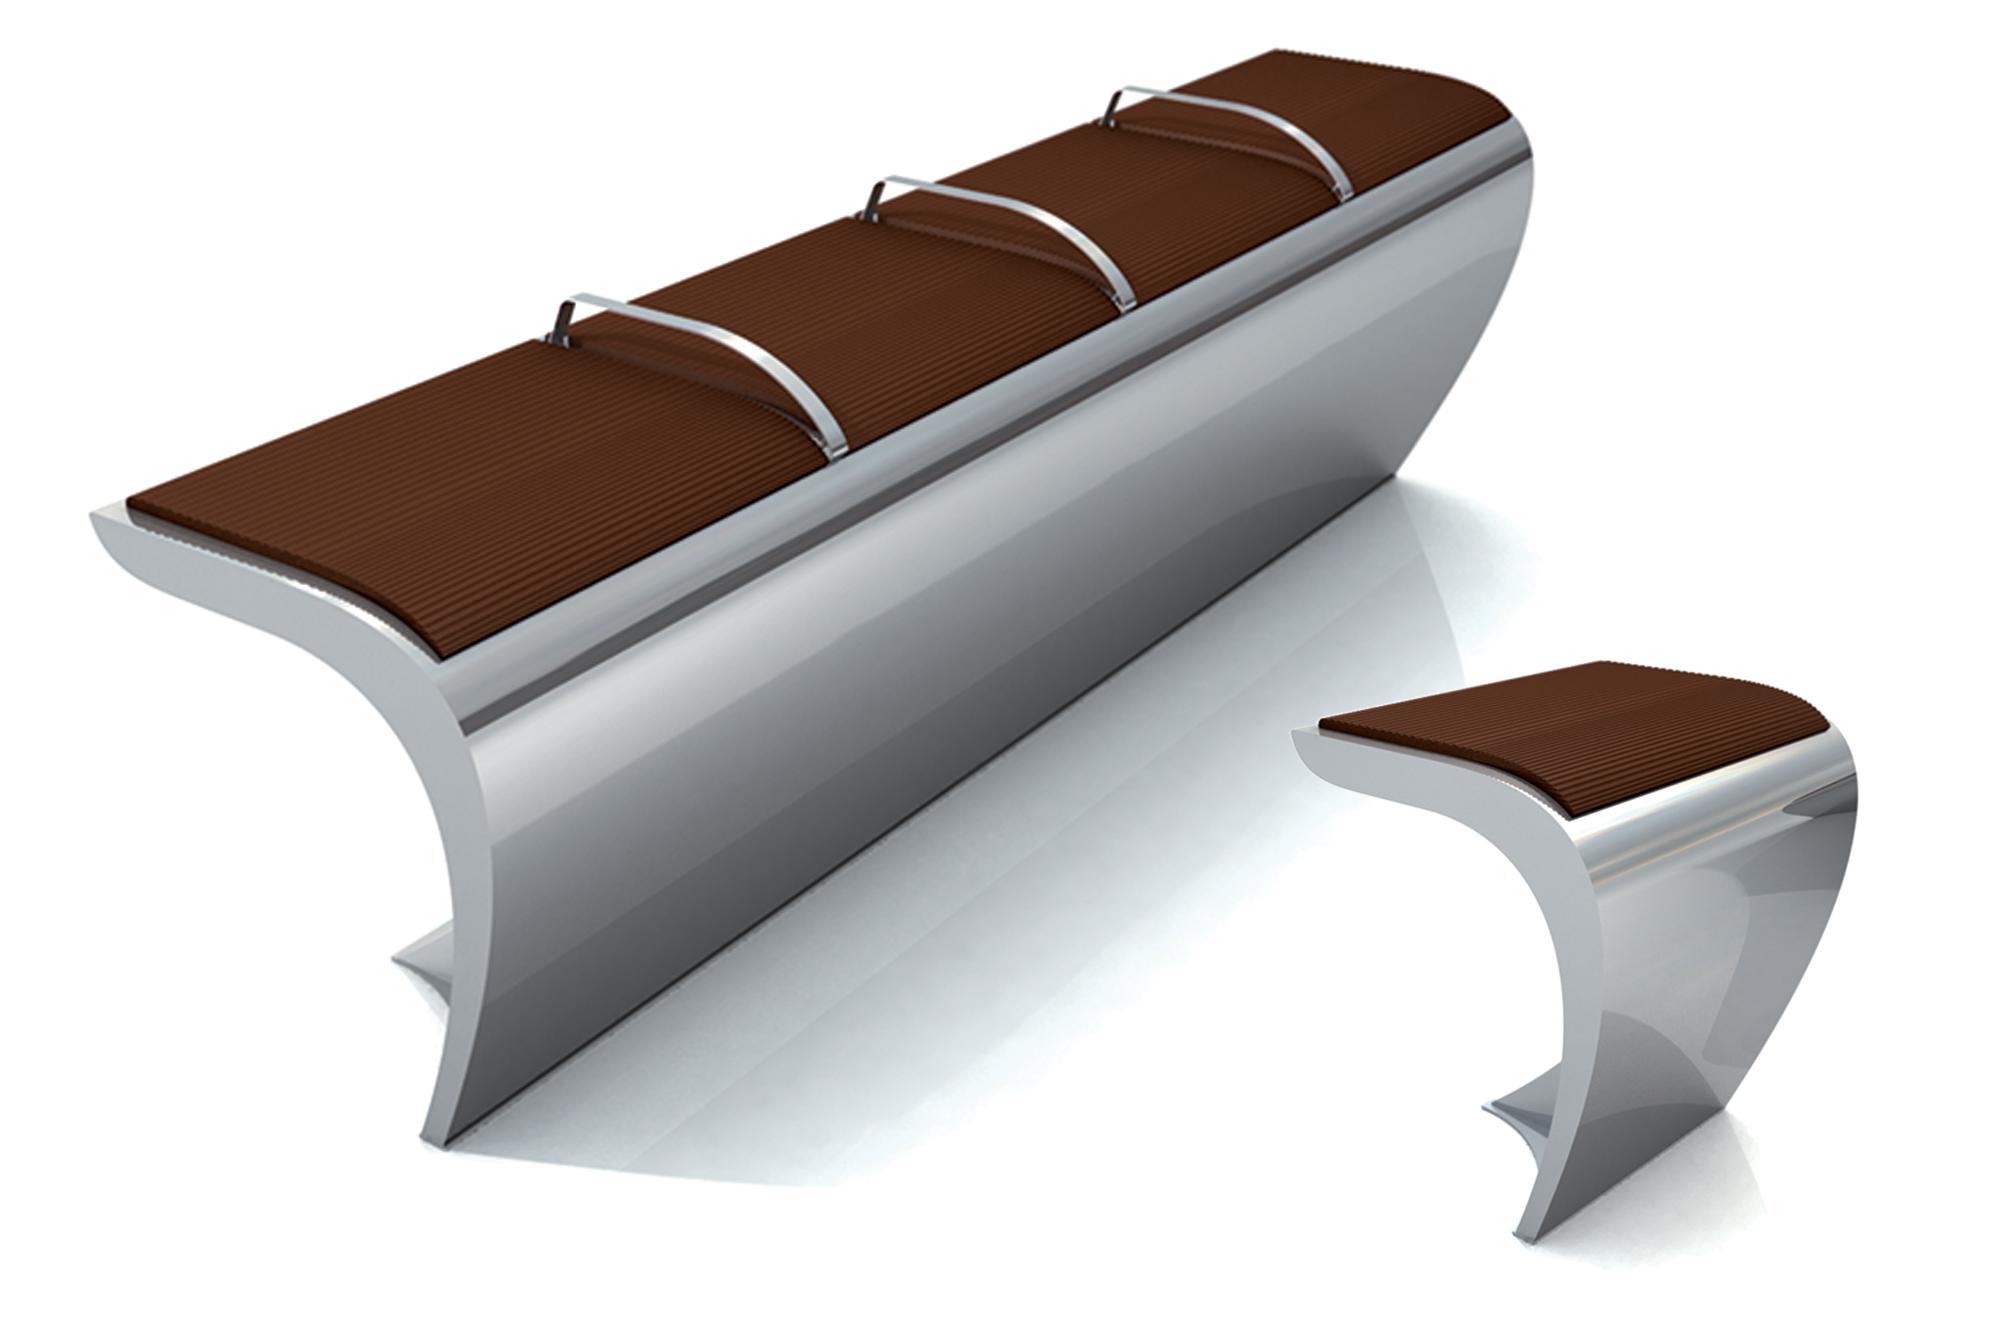 Mobilier en inox pbo design agence de design global for Banc inox design